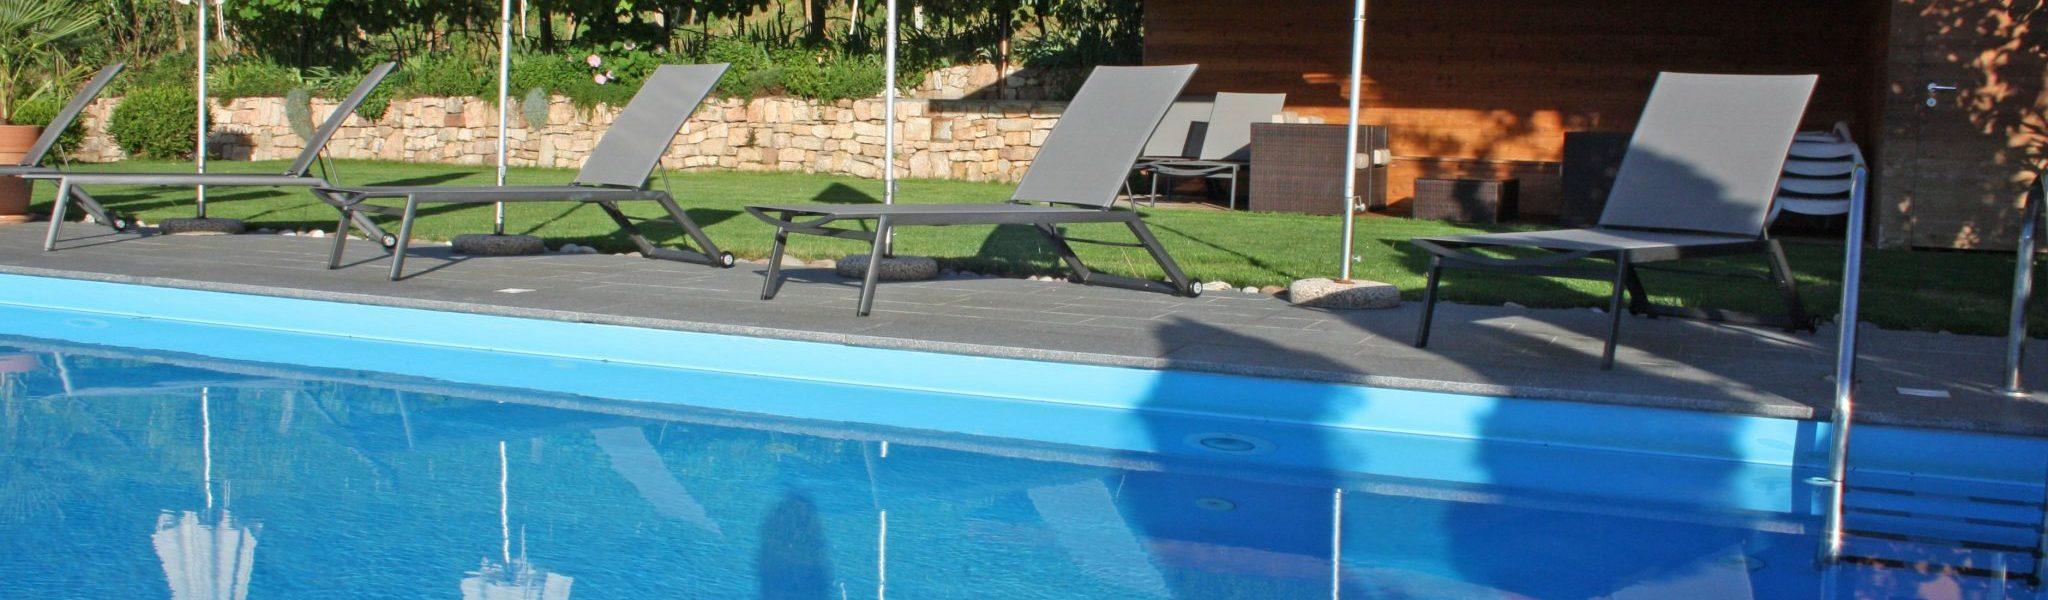 Pool am Runggnerhof